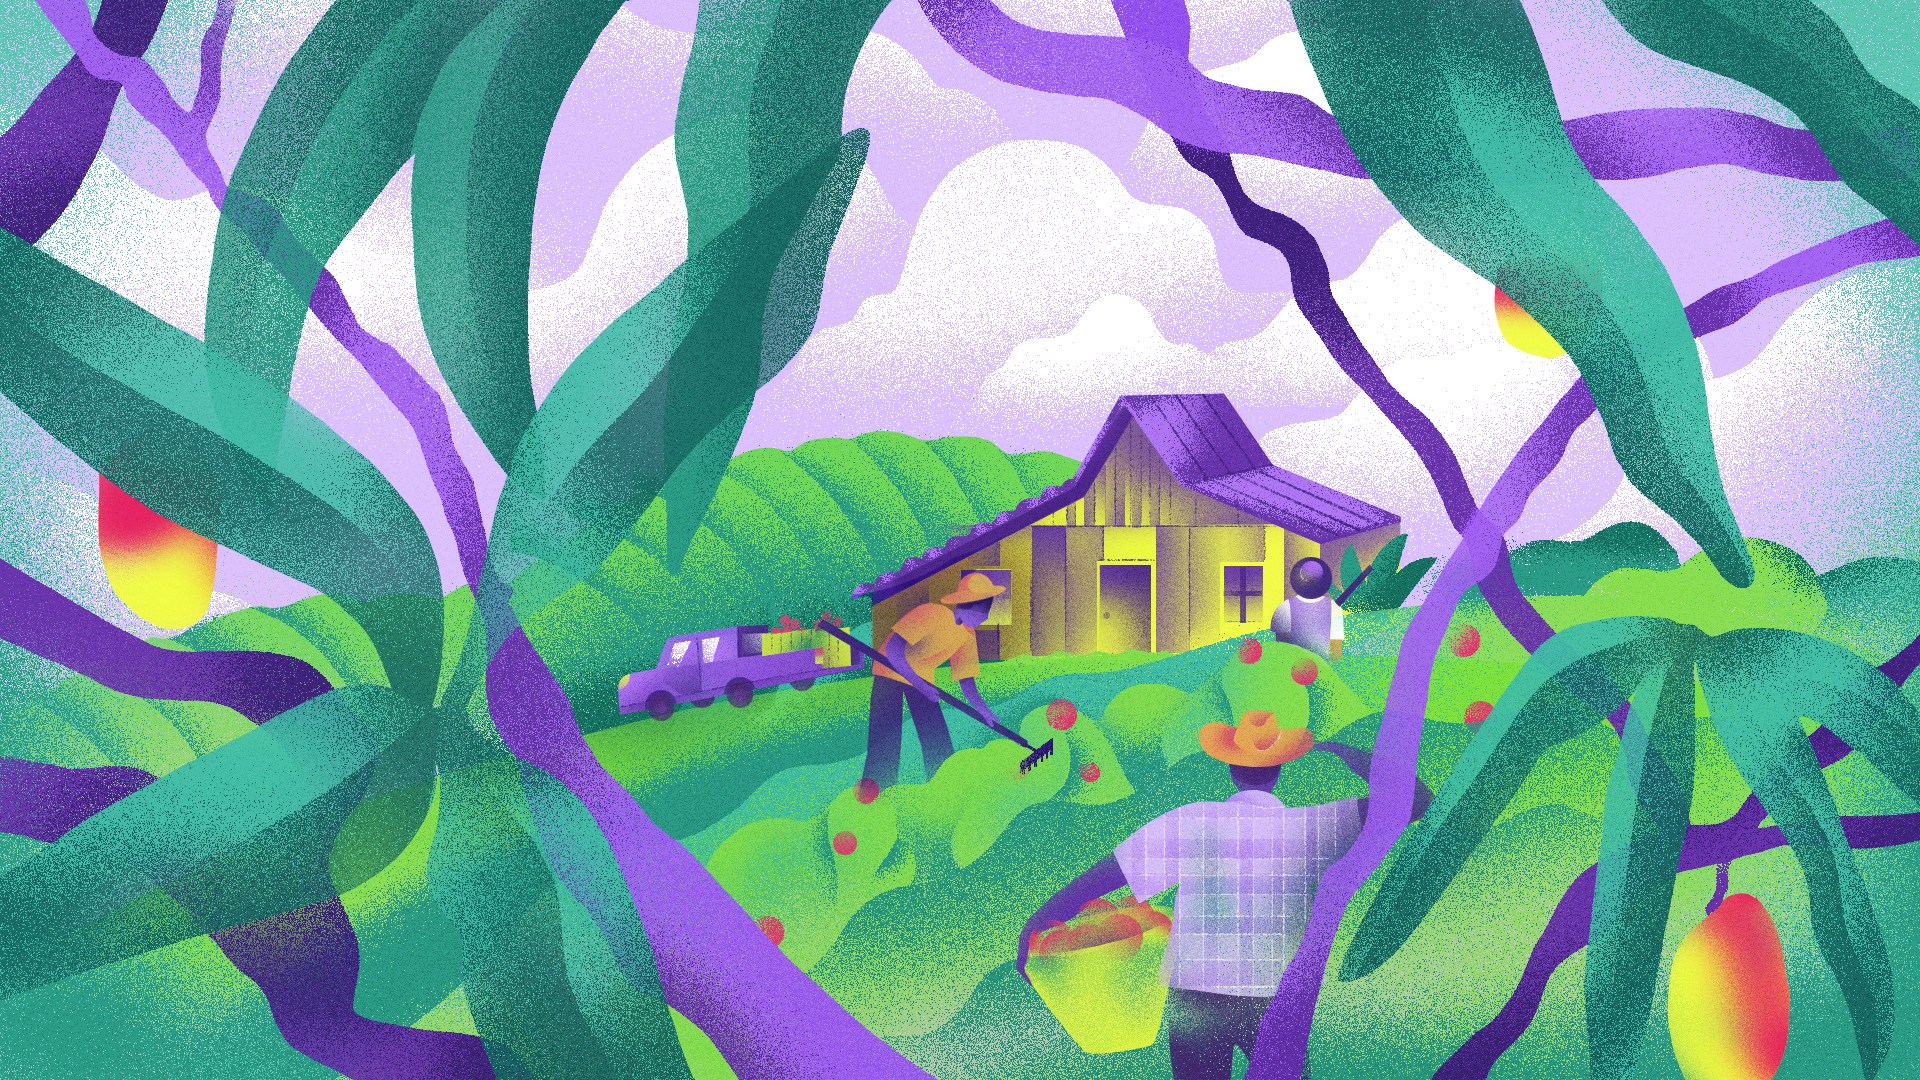 Illustration shows people harvesting crops in a lush landscape